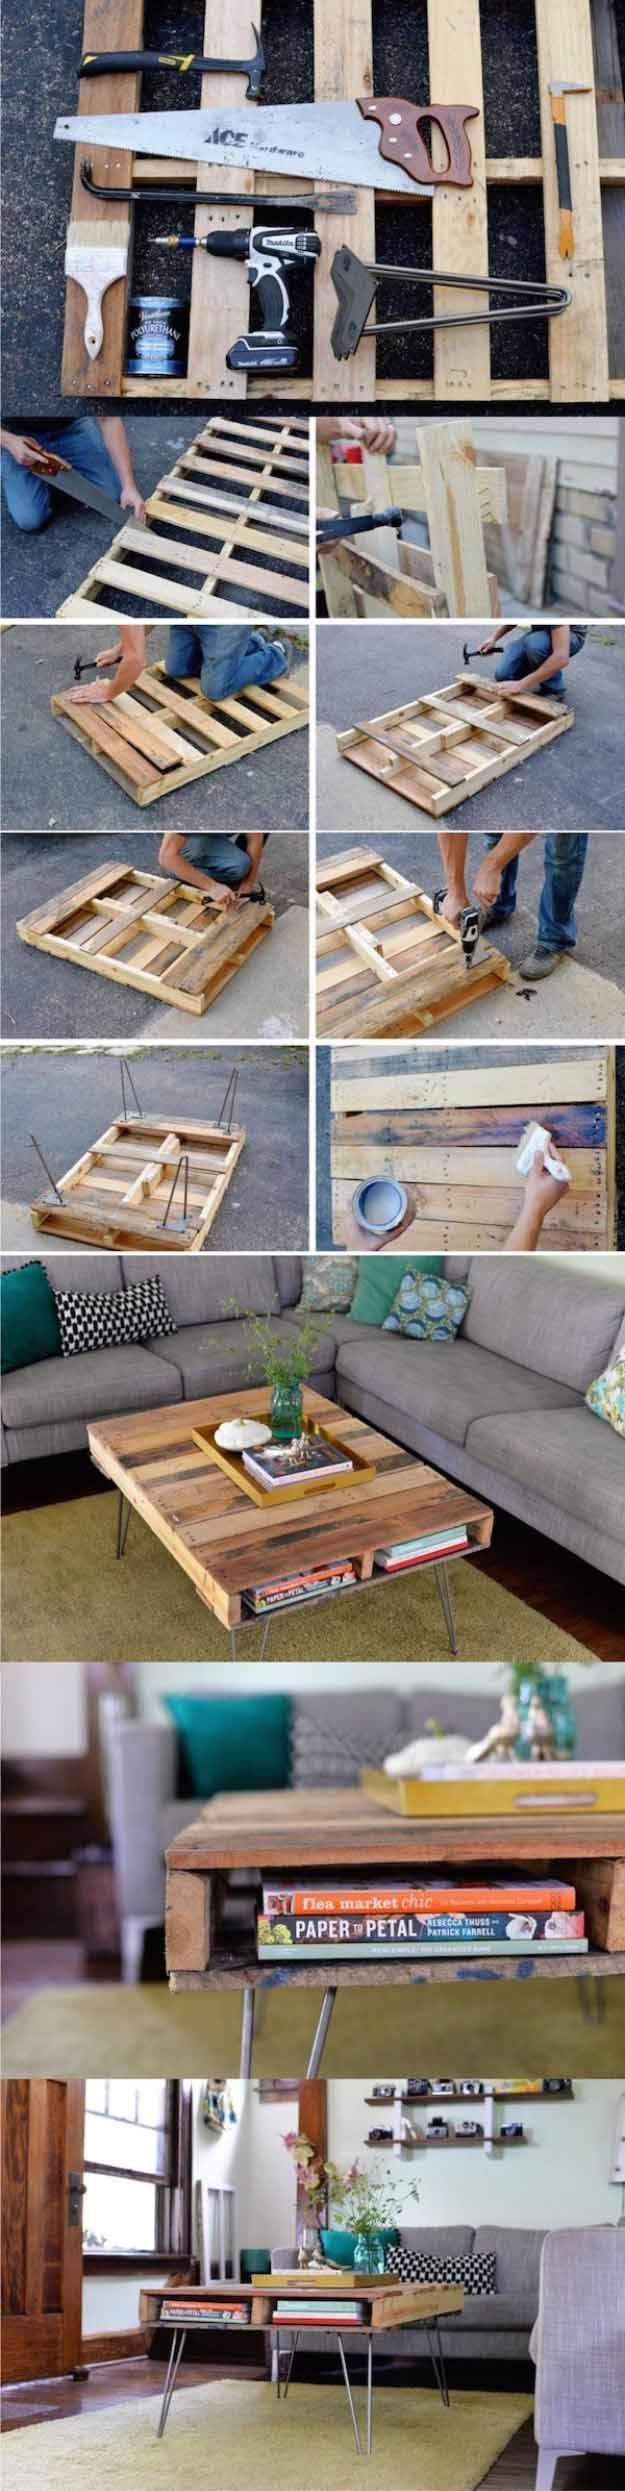 2017 05 wood coffee table diy - Sublime Top 100 Diy Furniture Ideas Https Decoratoo Com 2017